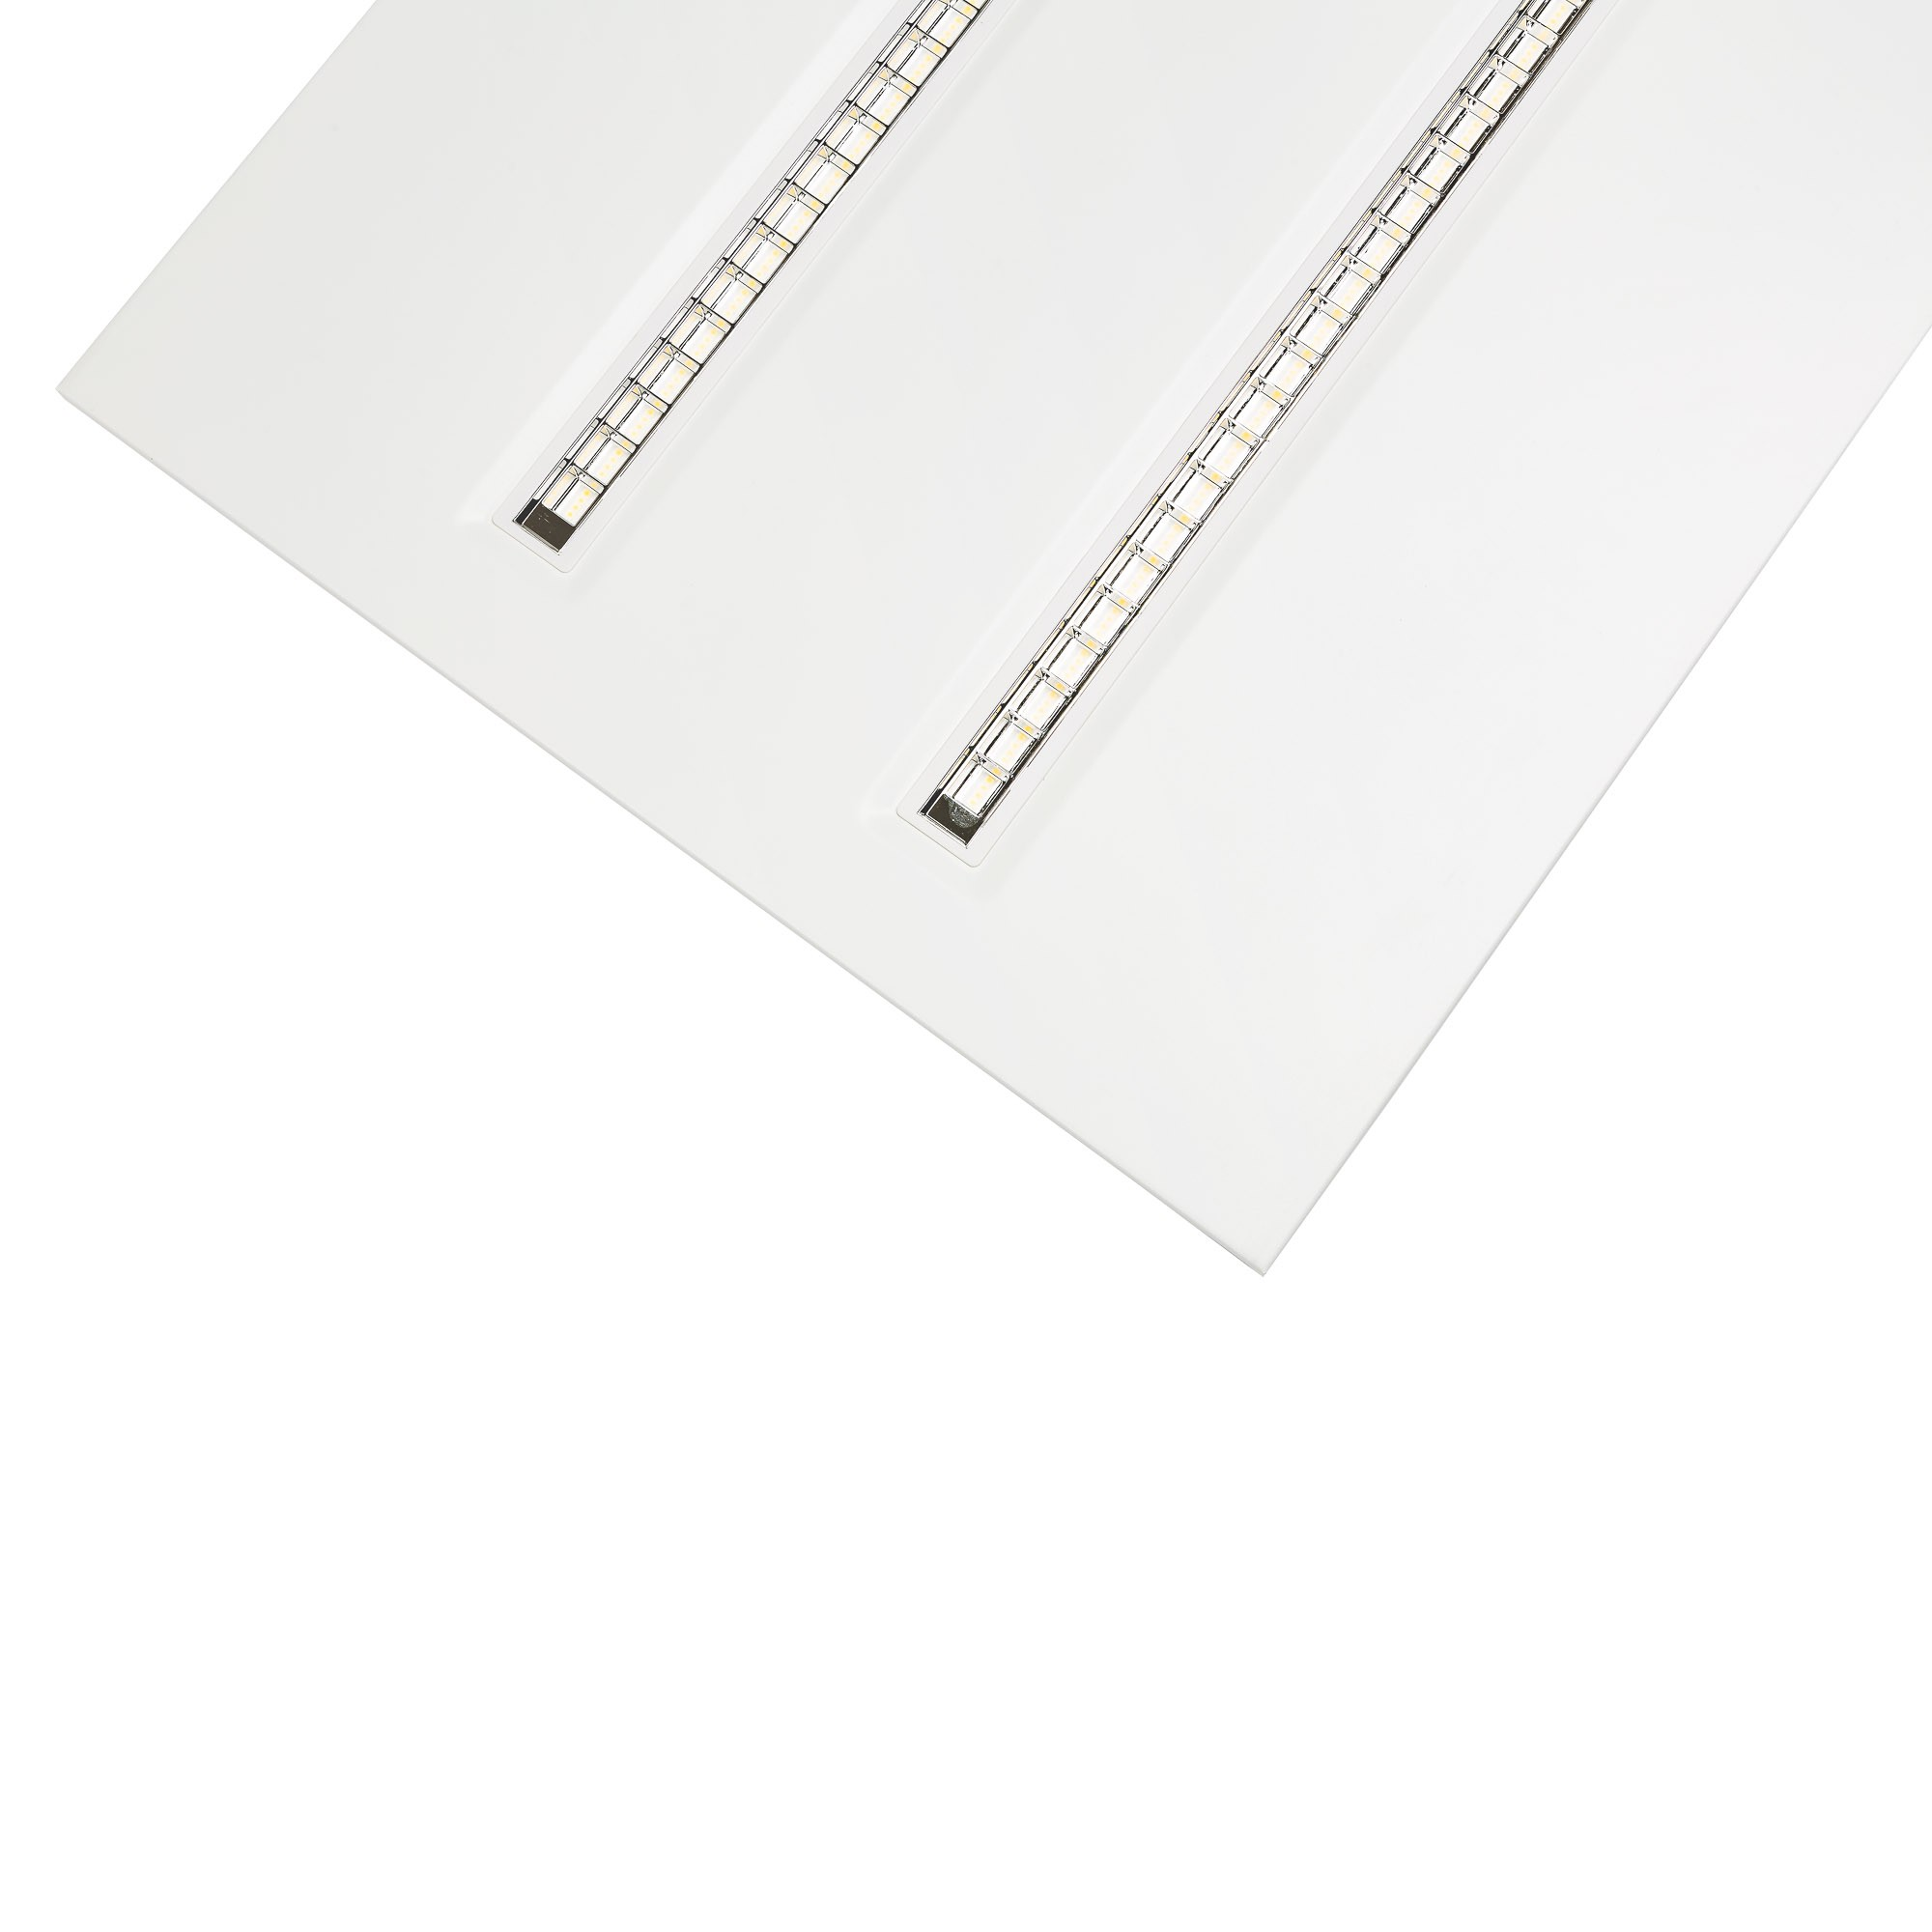 UGR<16 - LOW GLARE LED PANEL - 30W - 600mm X 600mm - 4000K